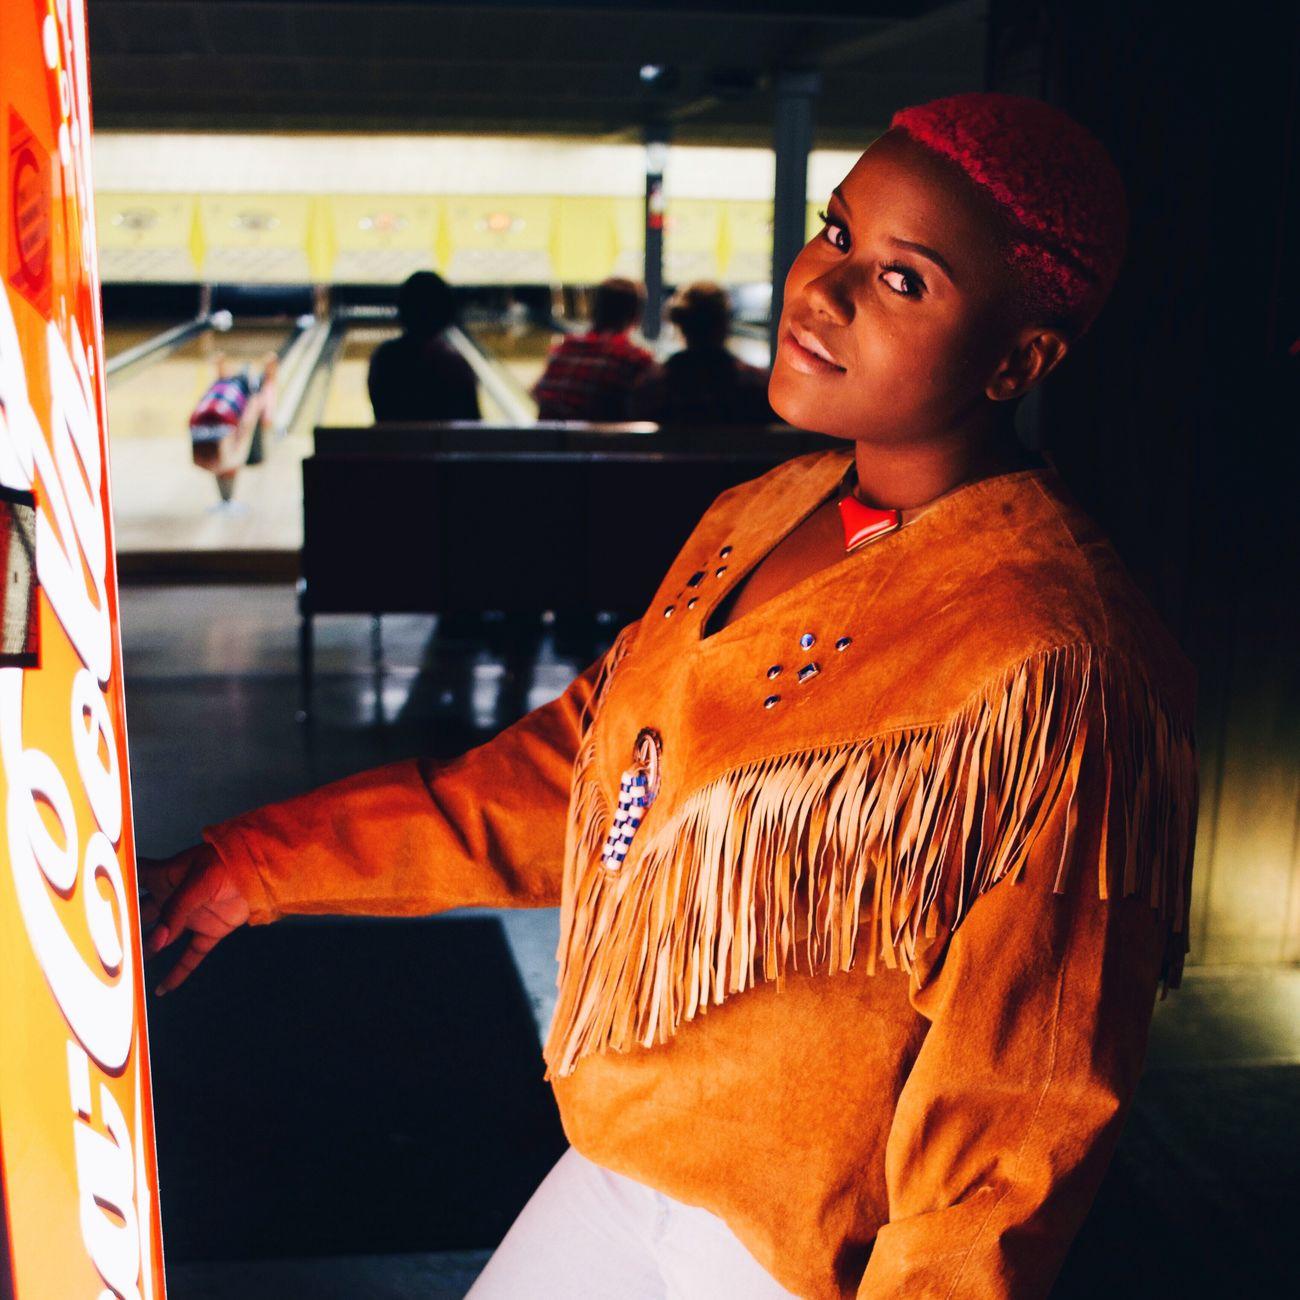 Portrait Leisure Activity Cocacola Pink Wild Soda Machine Bowling Alley Fun Night Beautiful Girl Fresh On Eyeem